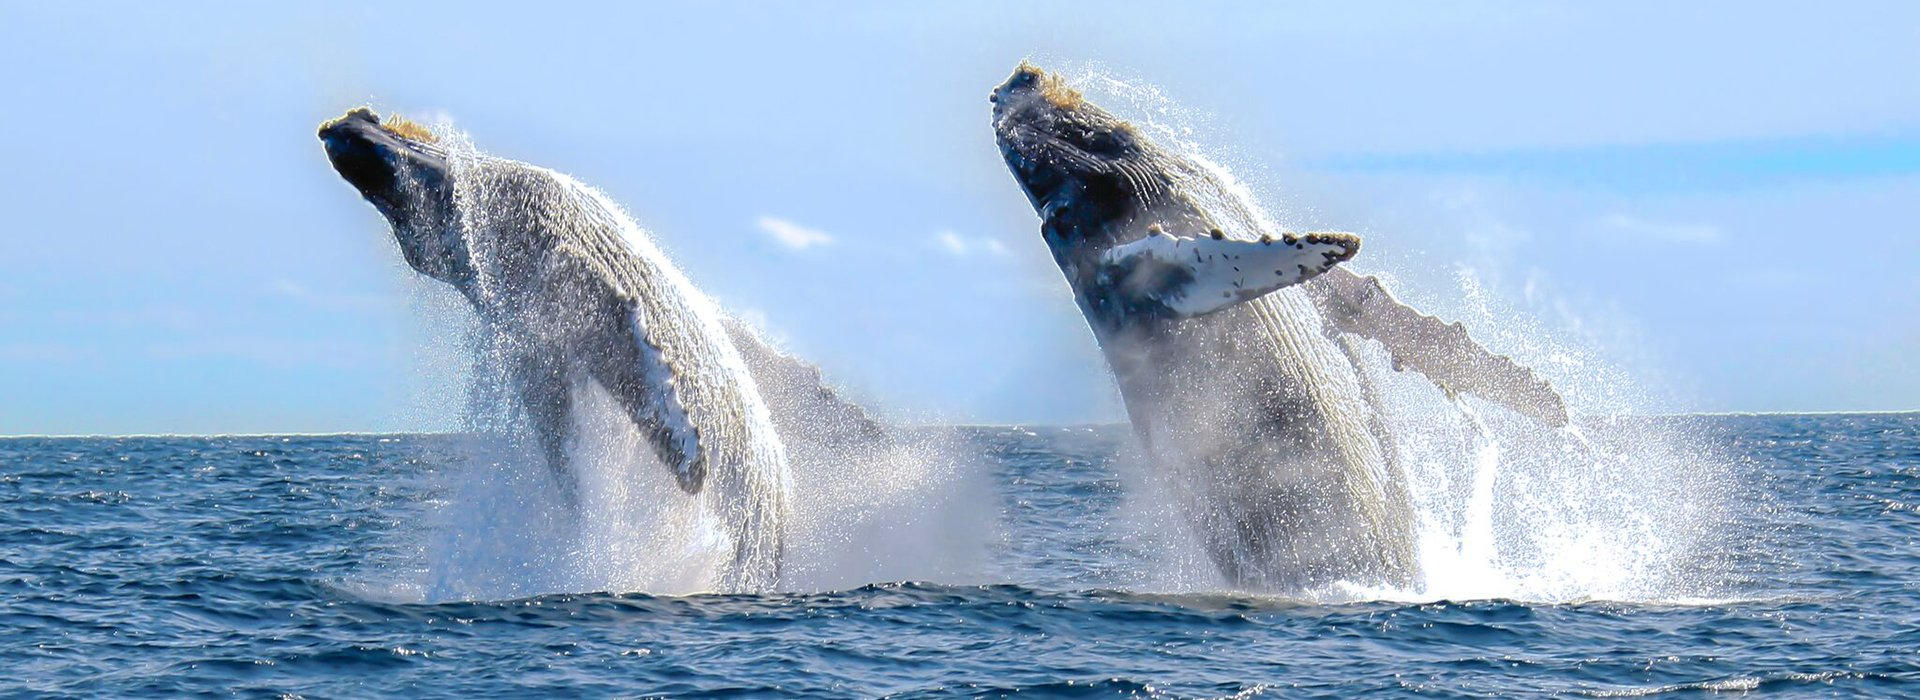 whalewatching 1